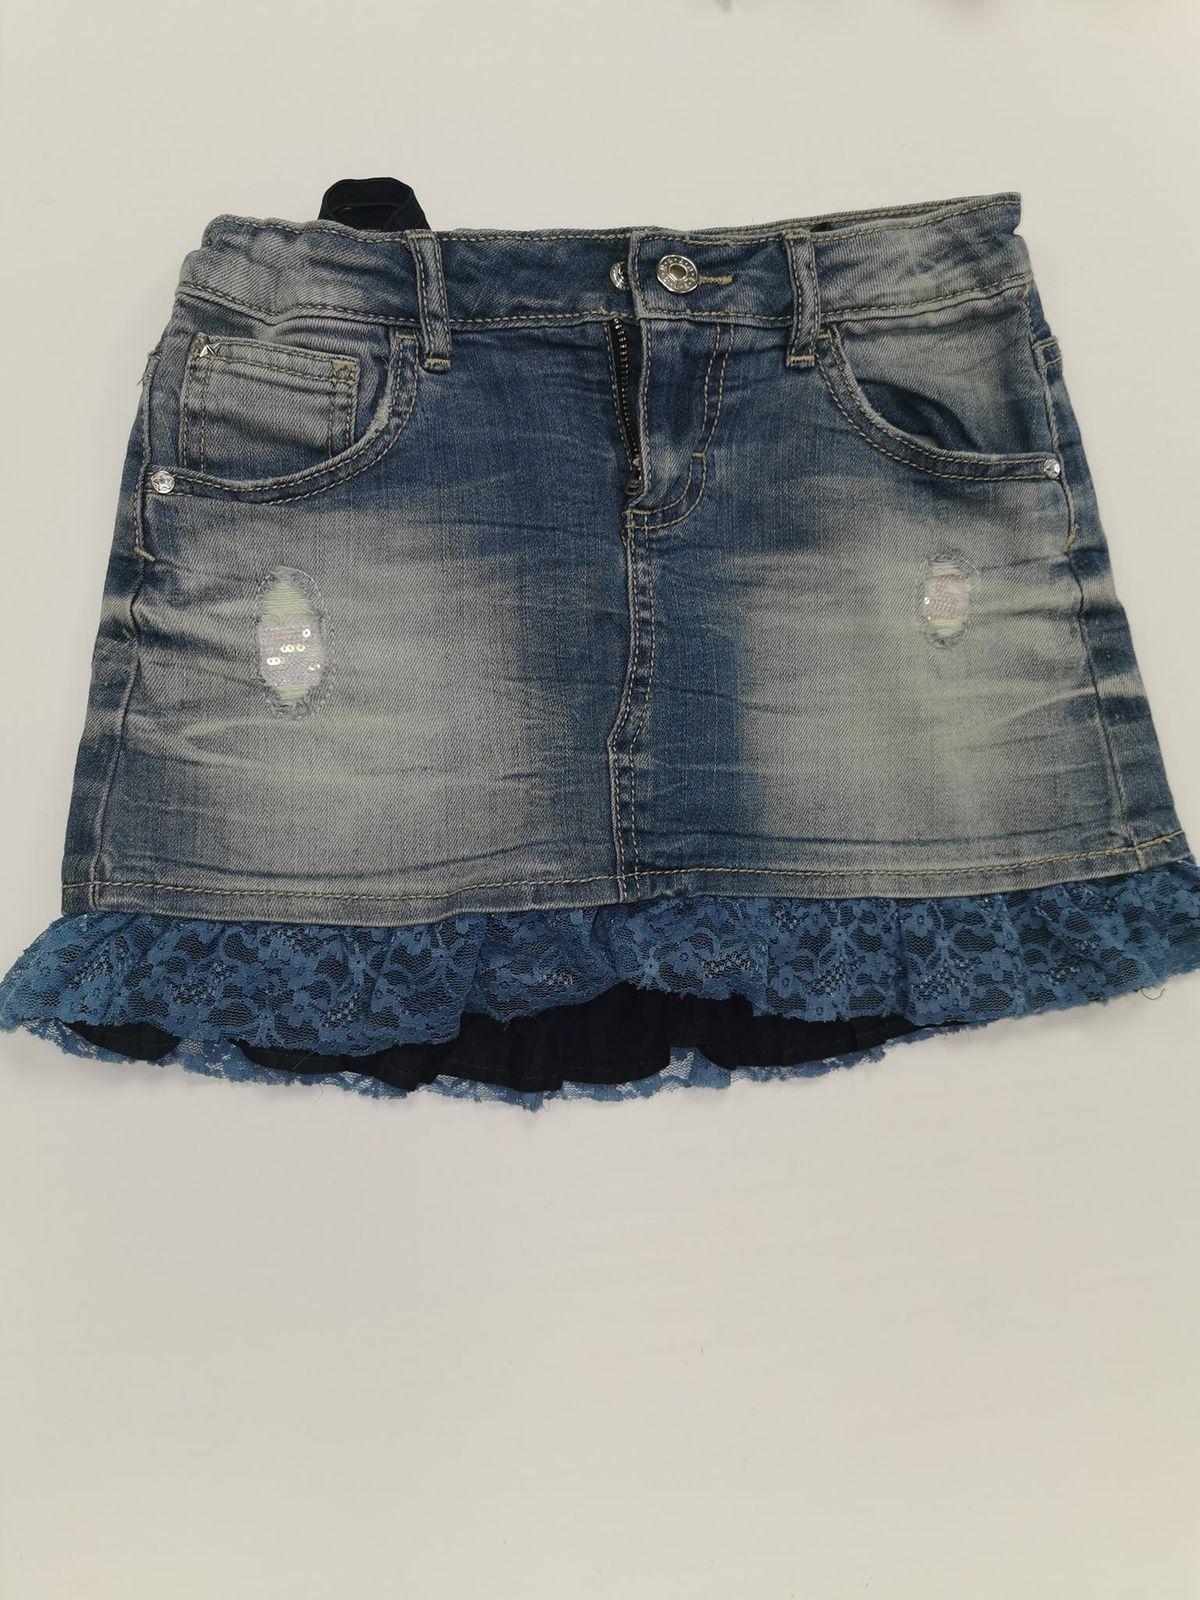 13273. Minigonna 8/9 anni jeans Euro 8,50